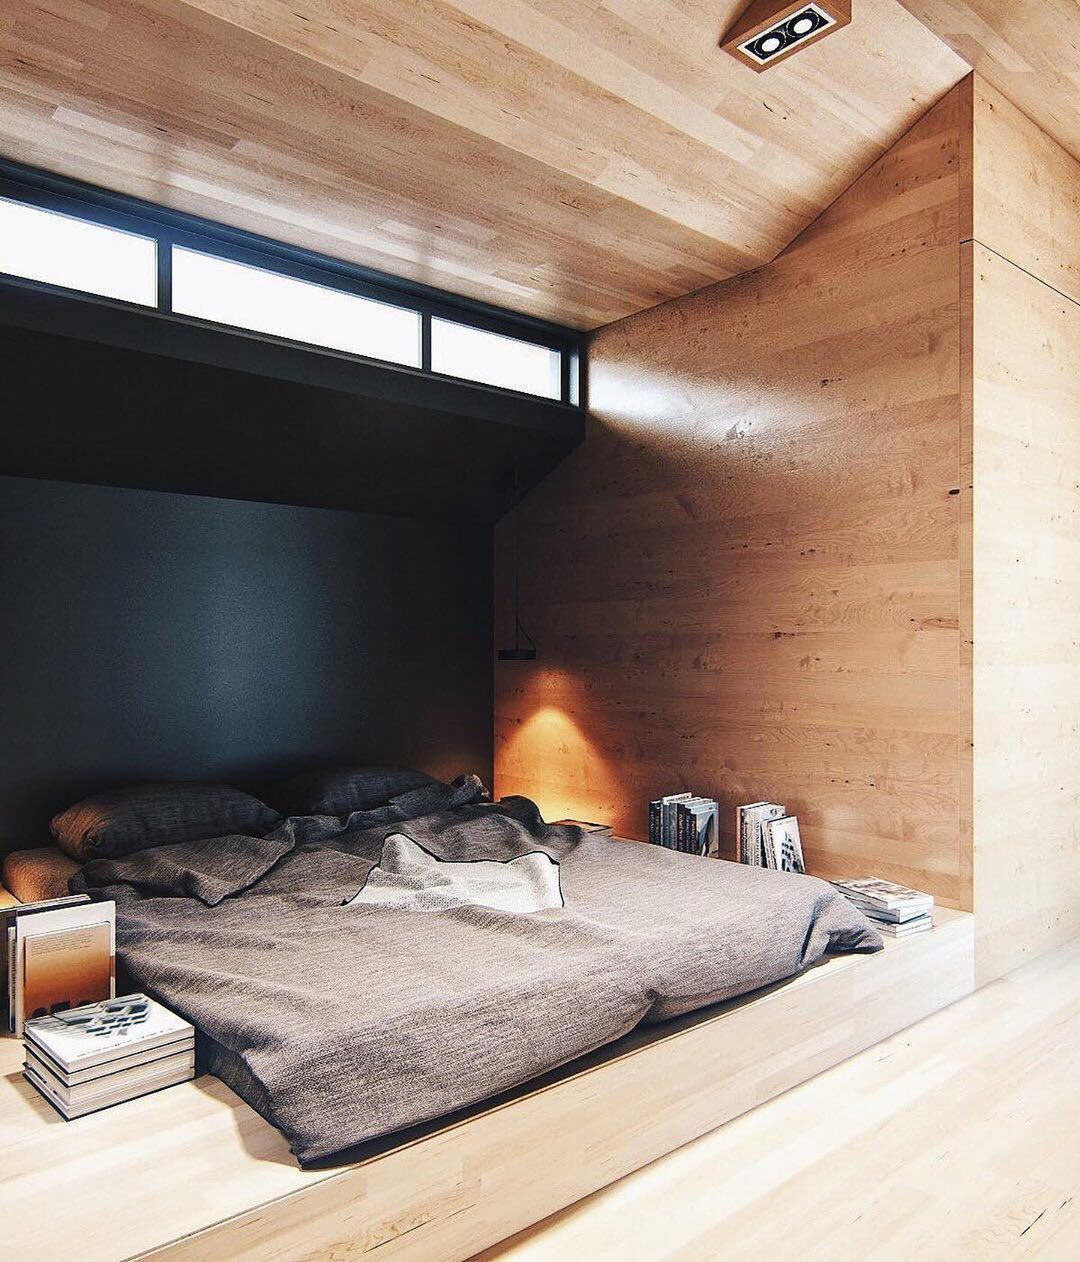 "1 Bedroom Loft Apartment: LOFT INTERIOR DESIGN IDEAS On Instagram: ""⠀ 💡ОЦЕНИТЕ"